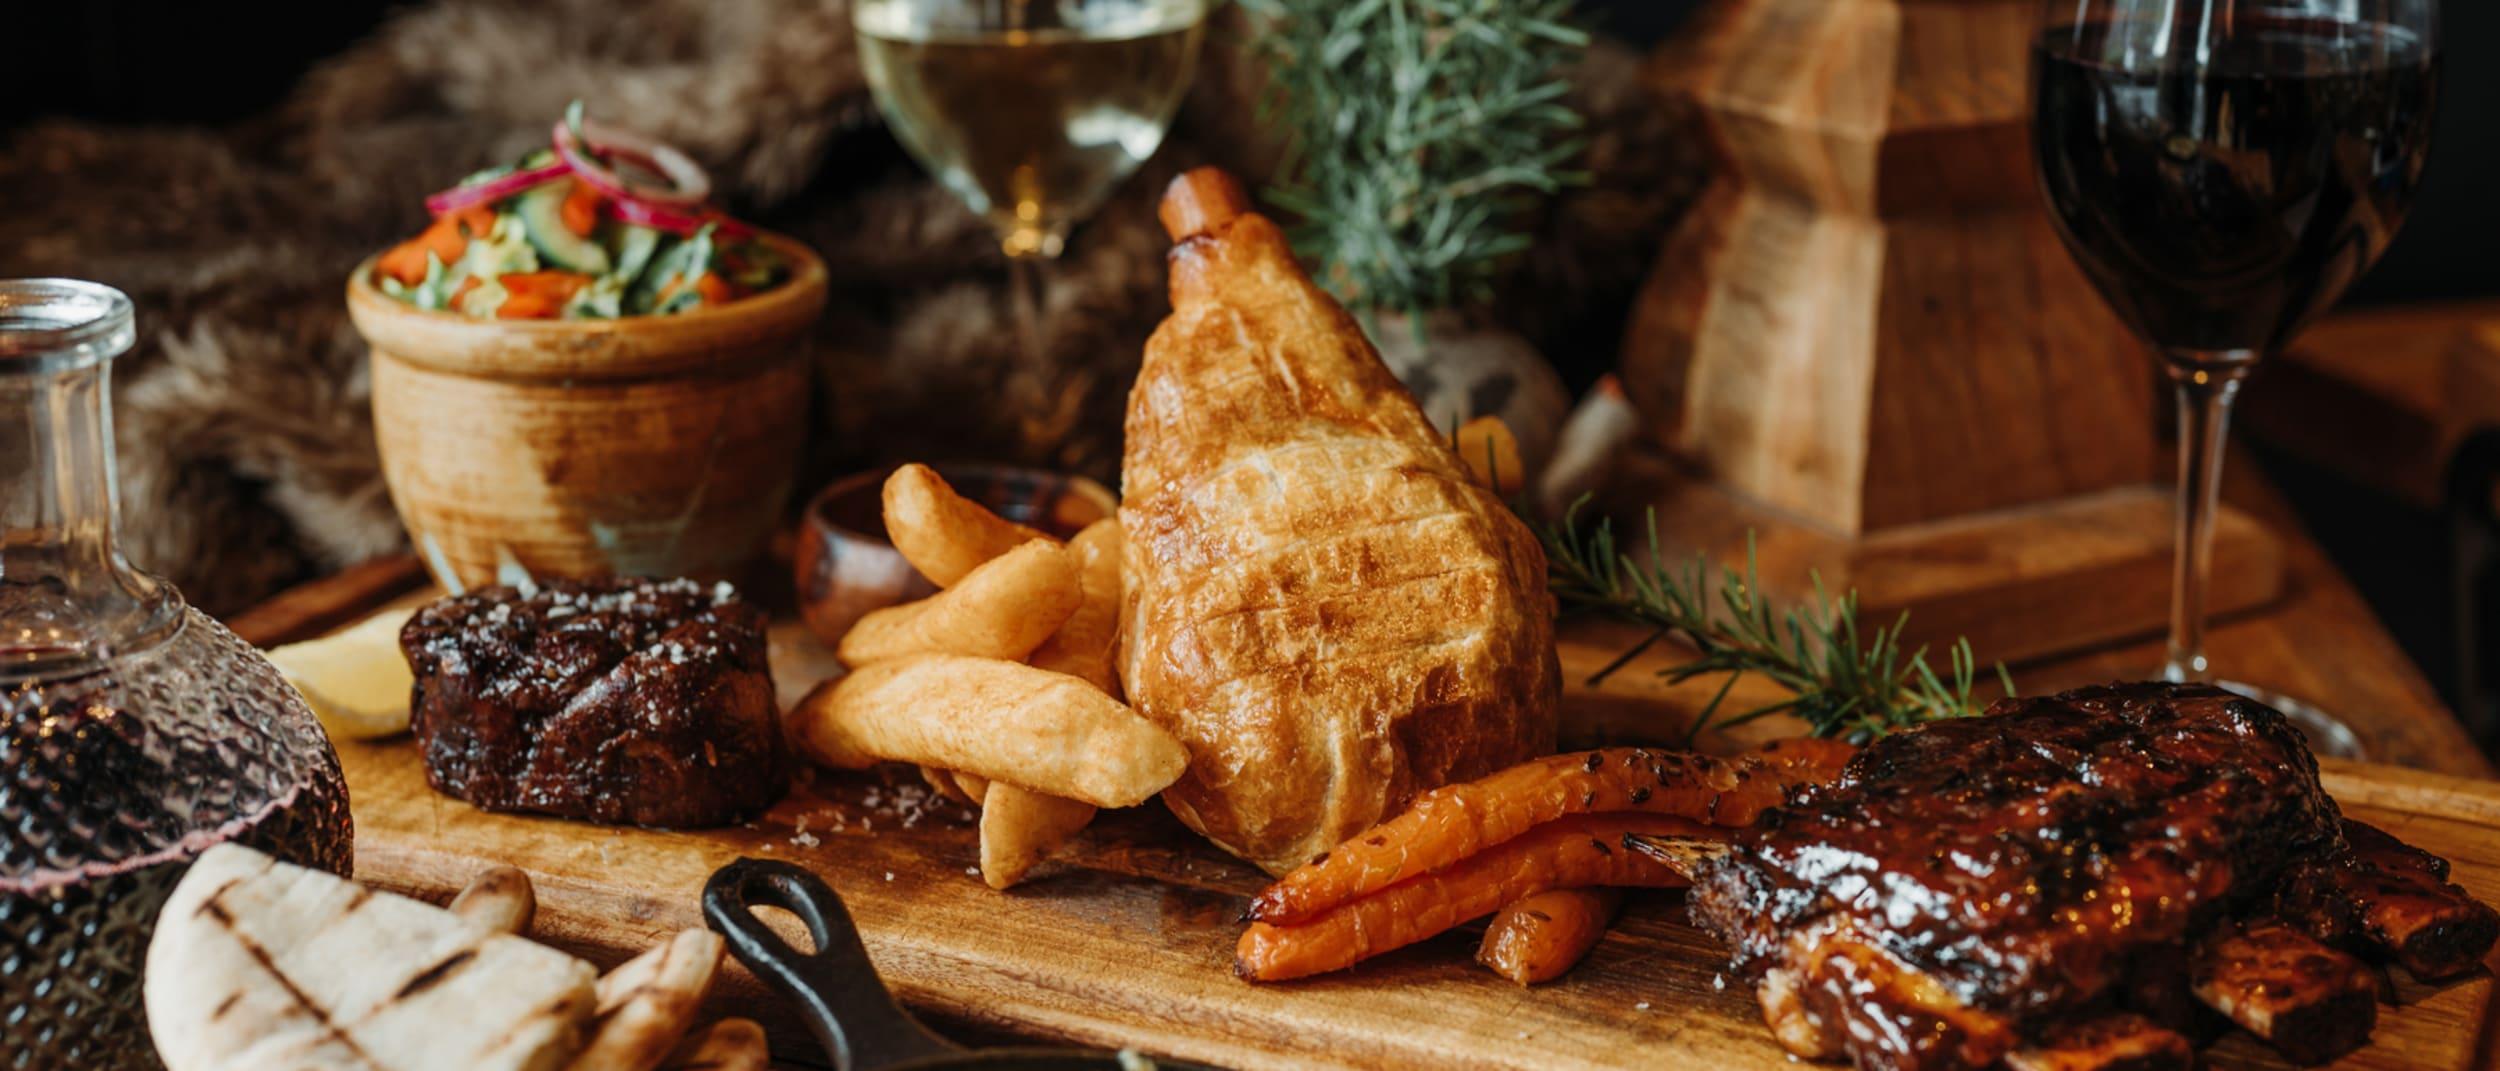 Unearth Hunter & Barrel's new summer menu